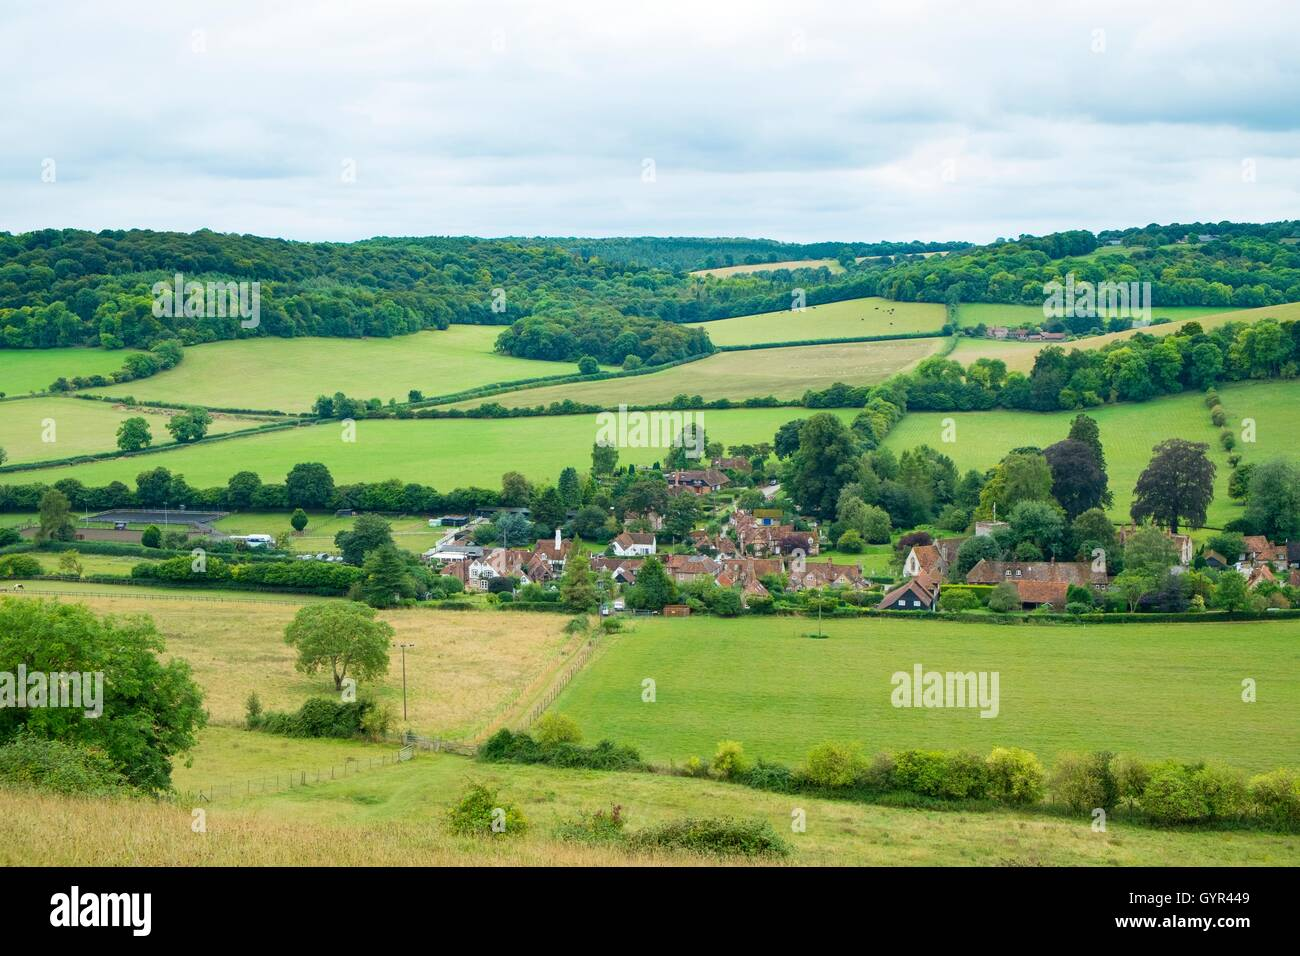 Turville Village, Hambleton Valley, The Chilterns, Buckinghamshire. - Stock Image